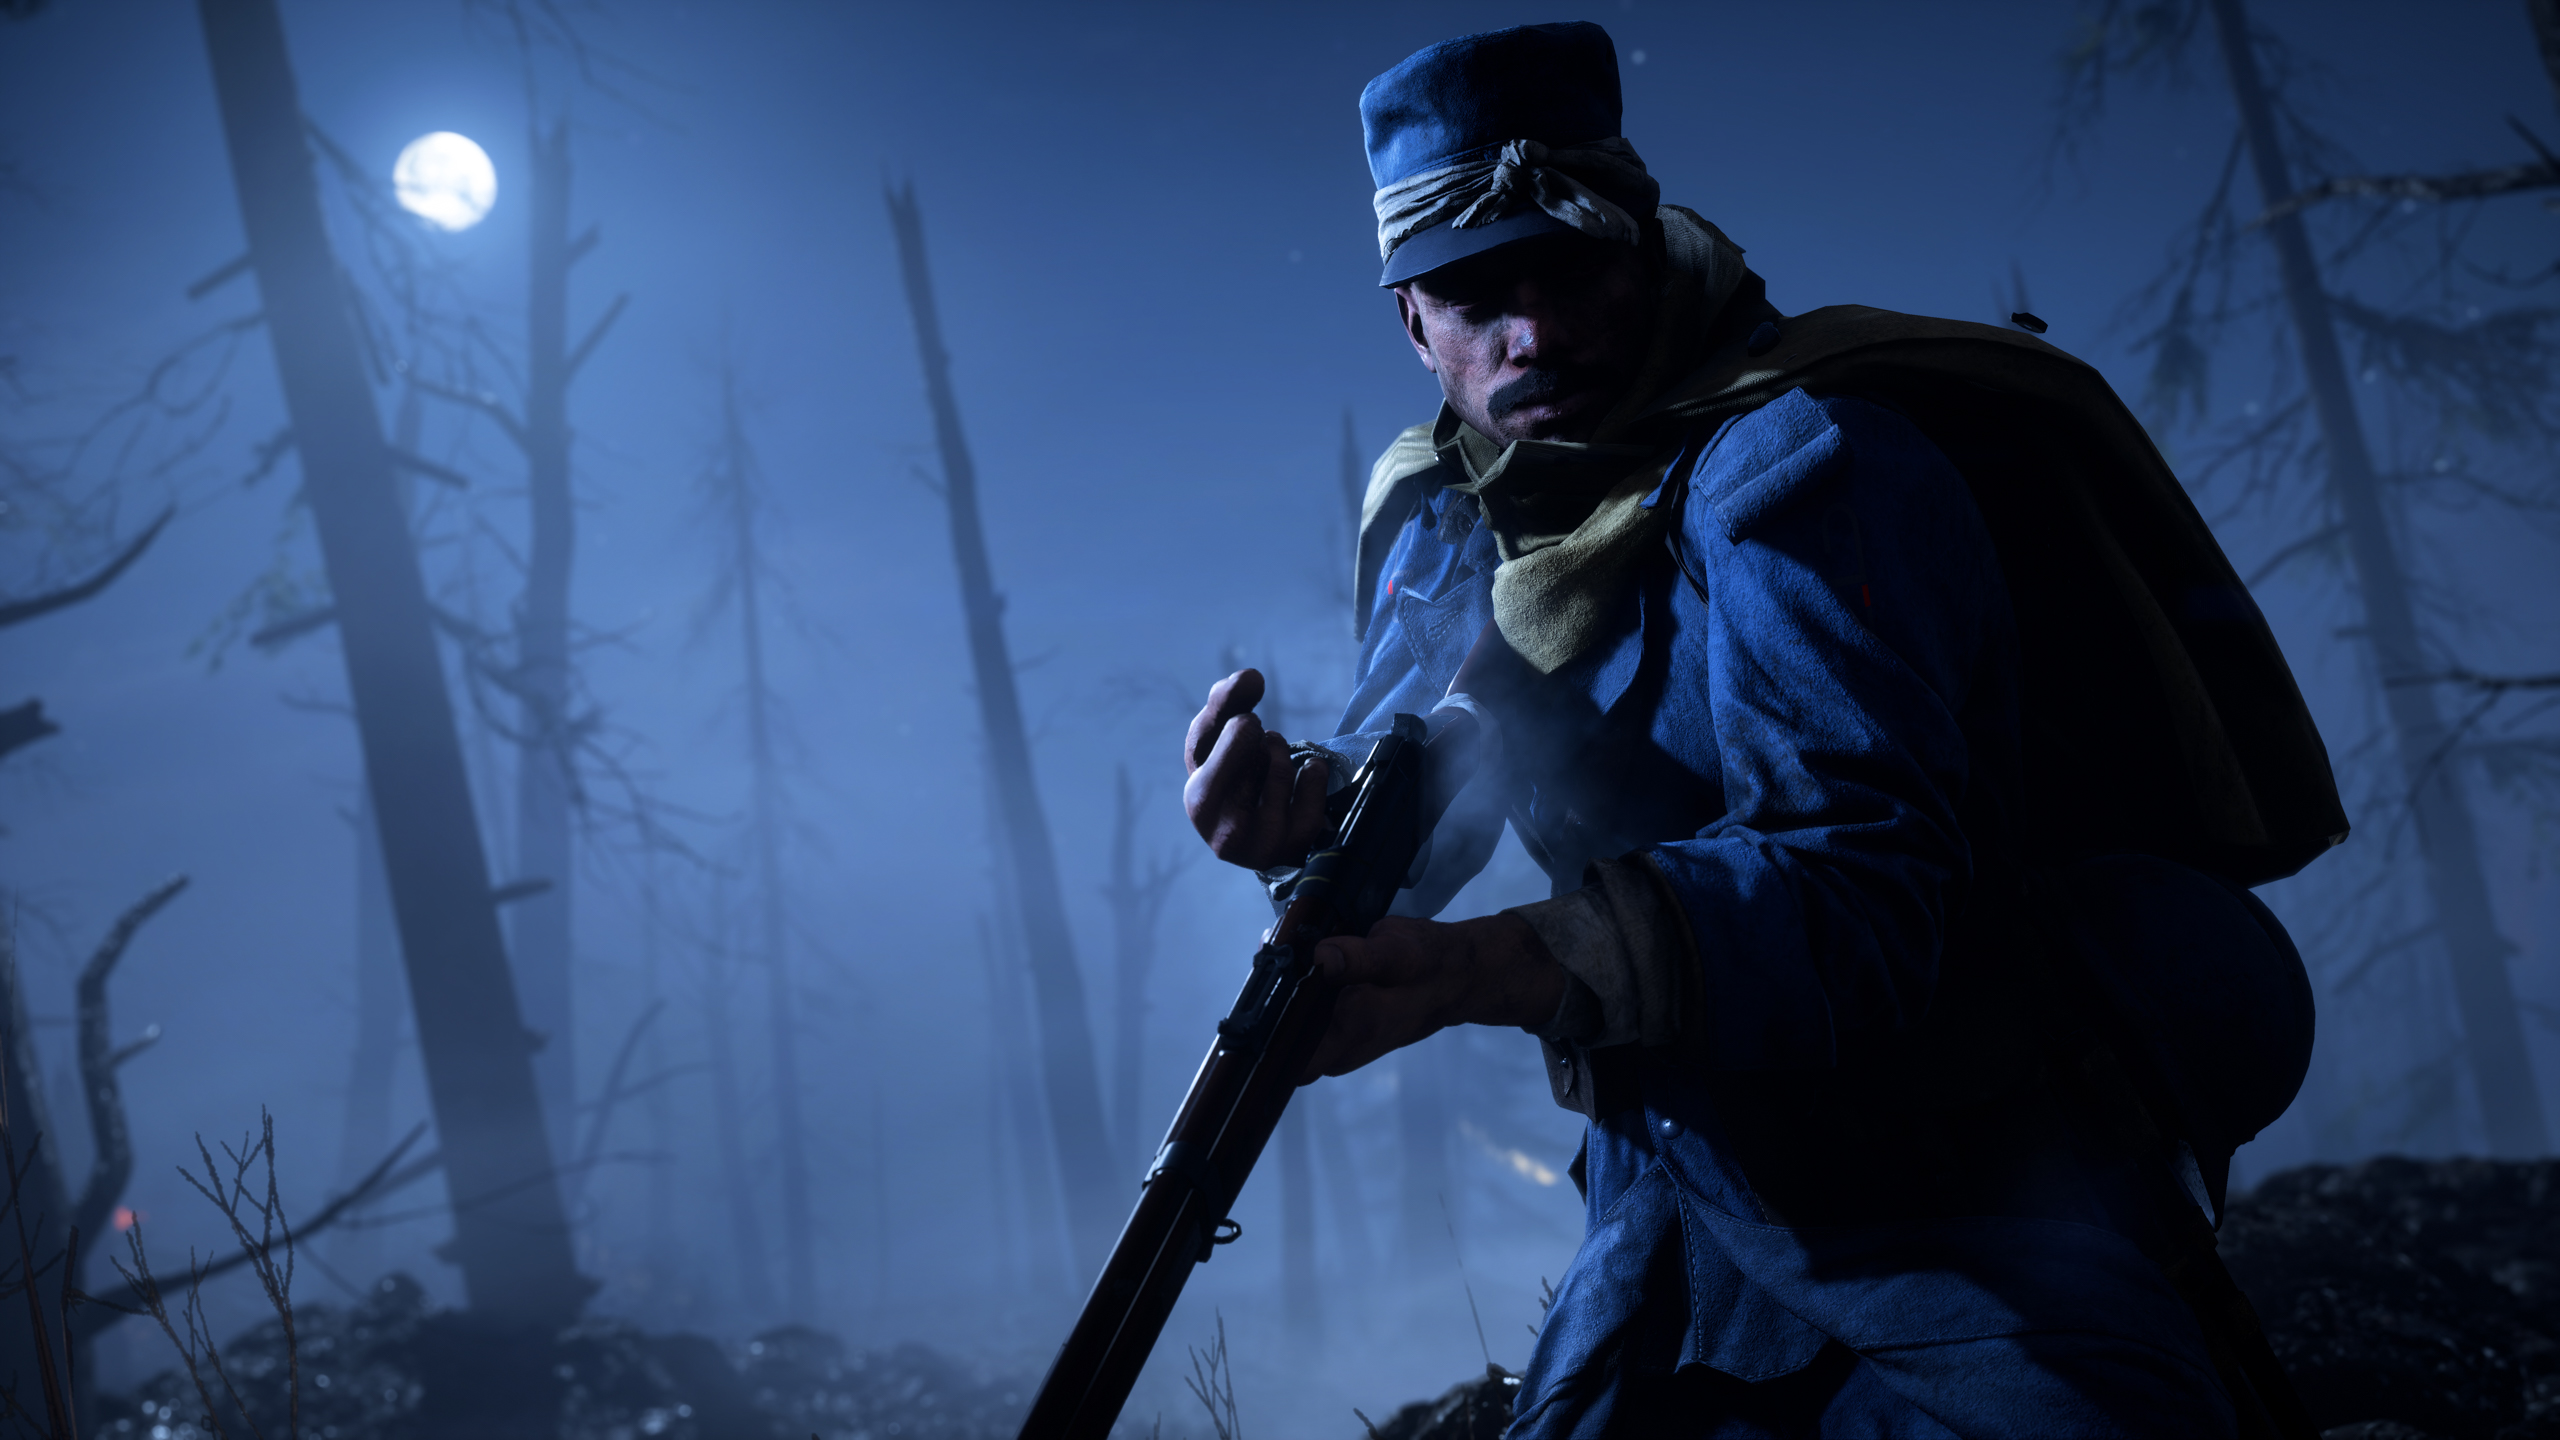 Battlefield 1 hd wallpaper background image 2560x1440 - Battlefield 1 french soldier ...